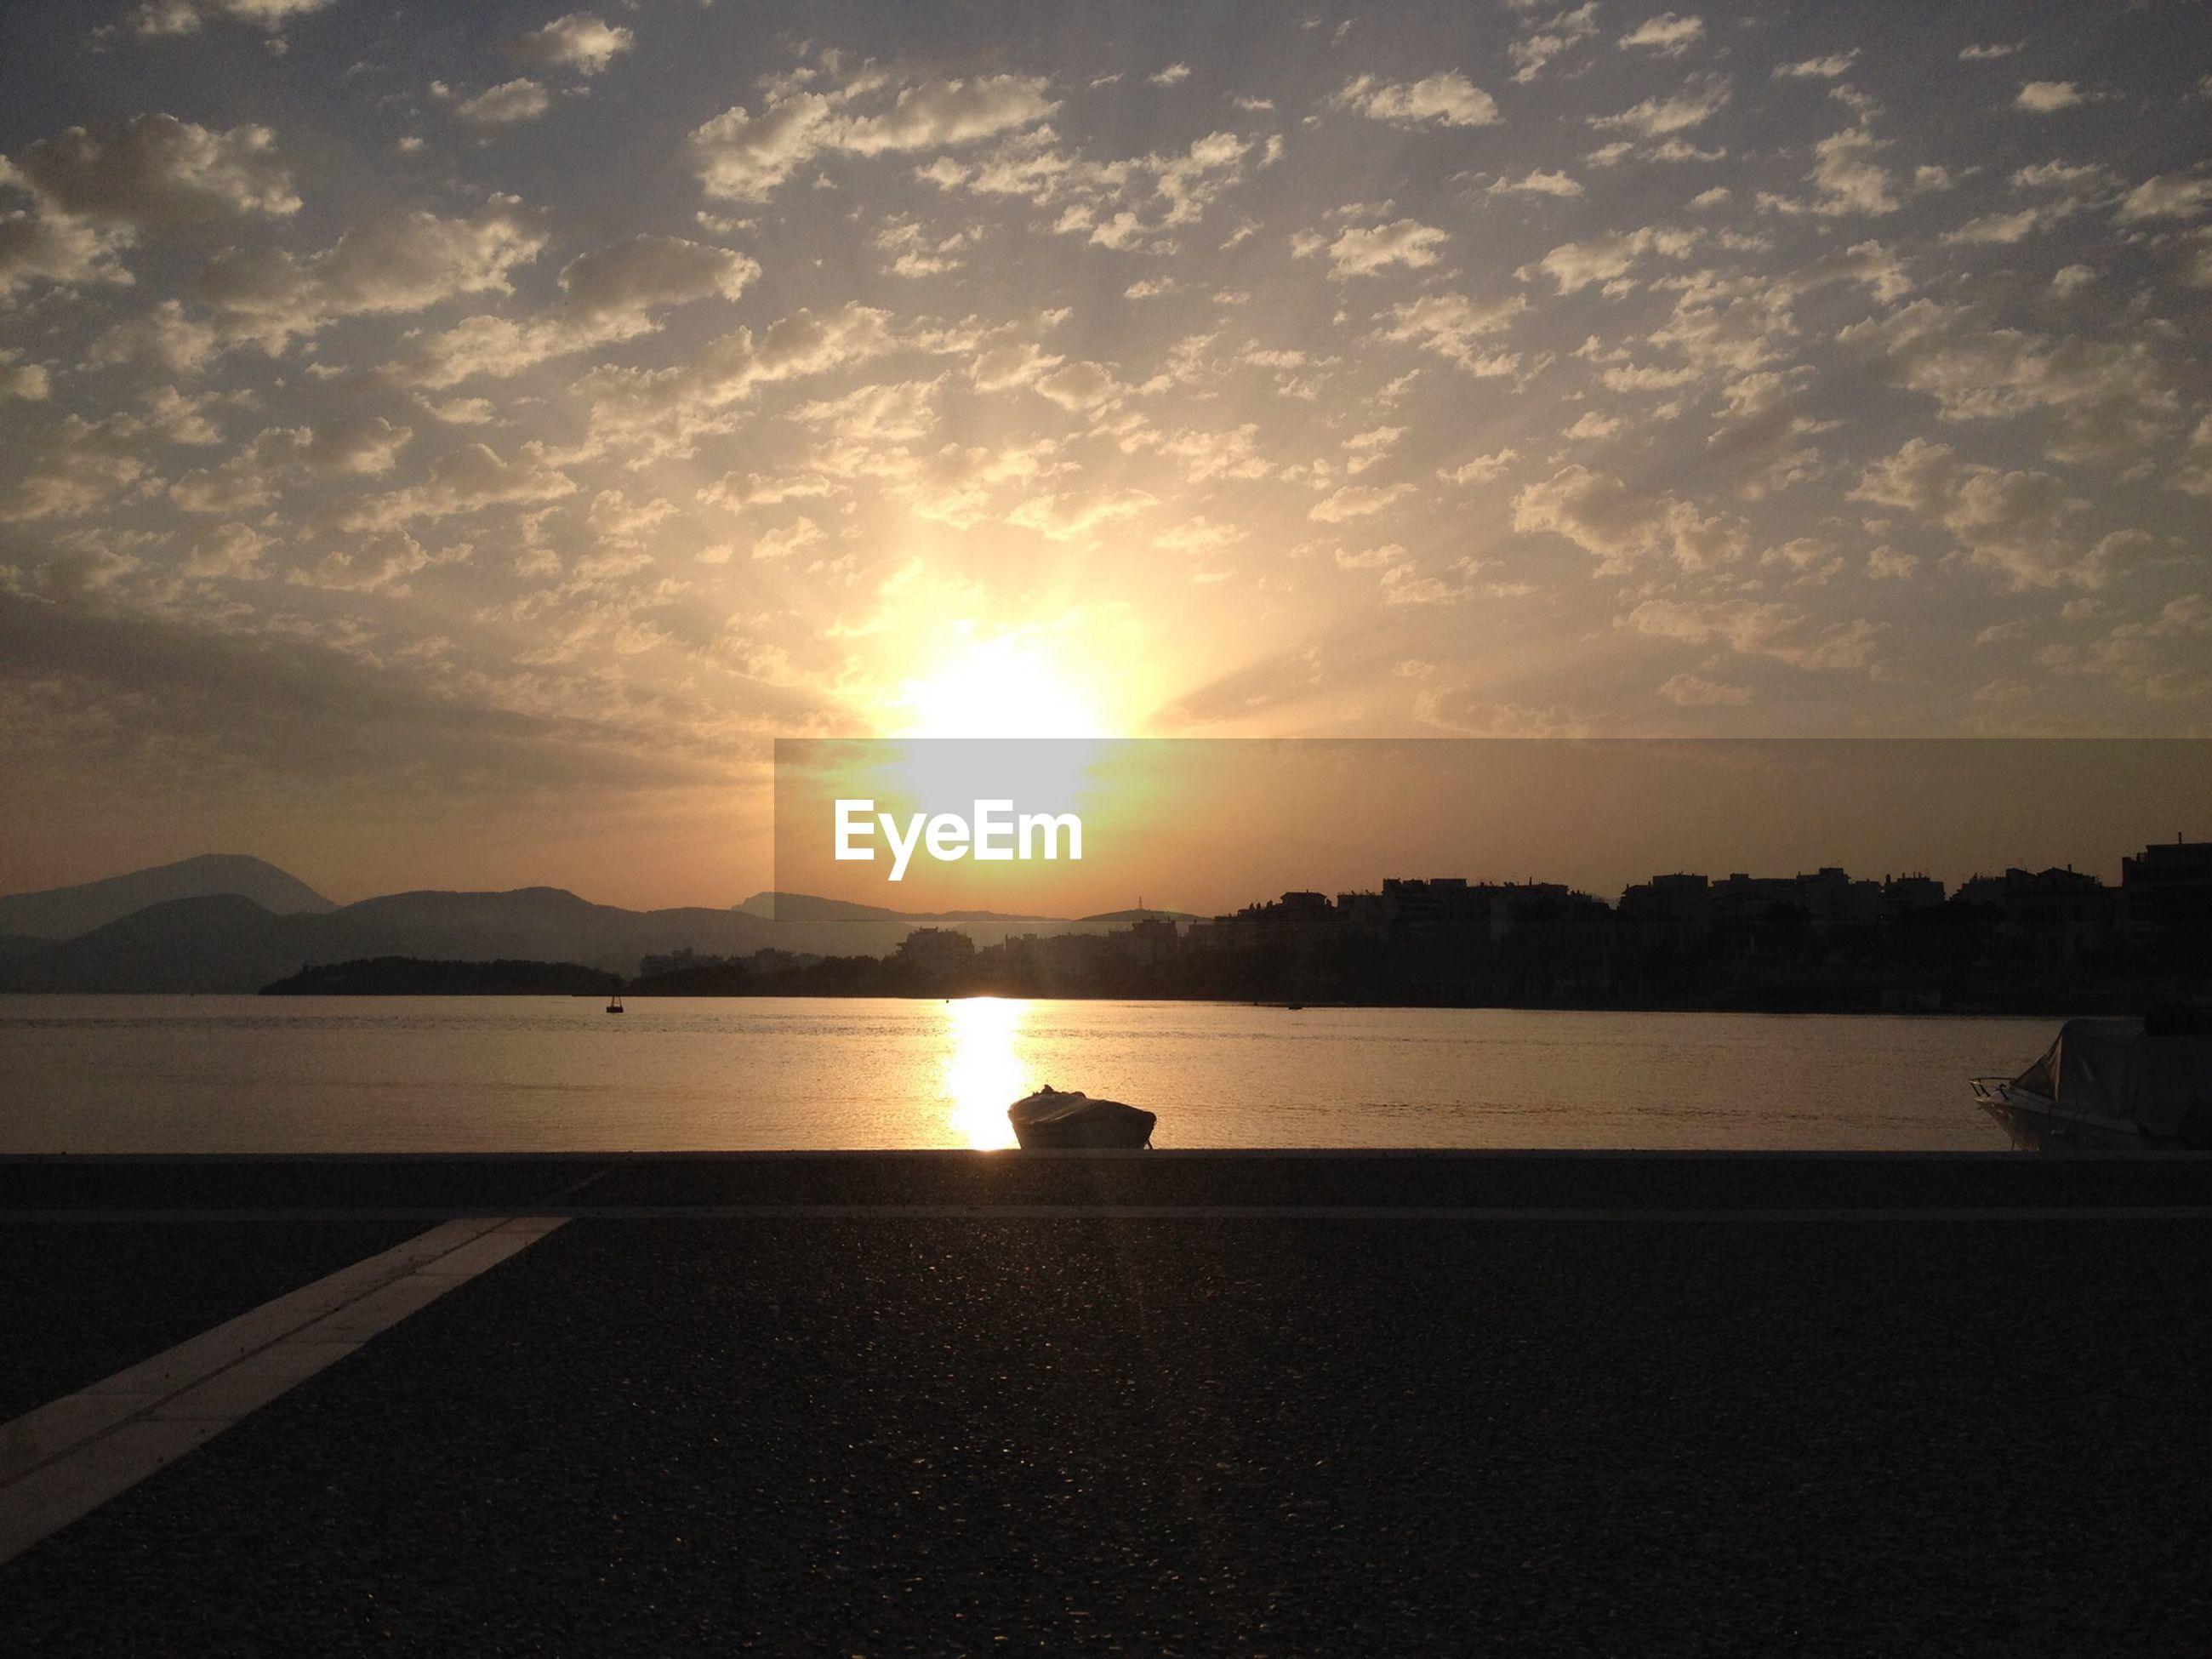 Morning sun reflecting in lake